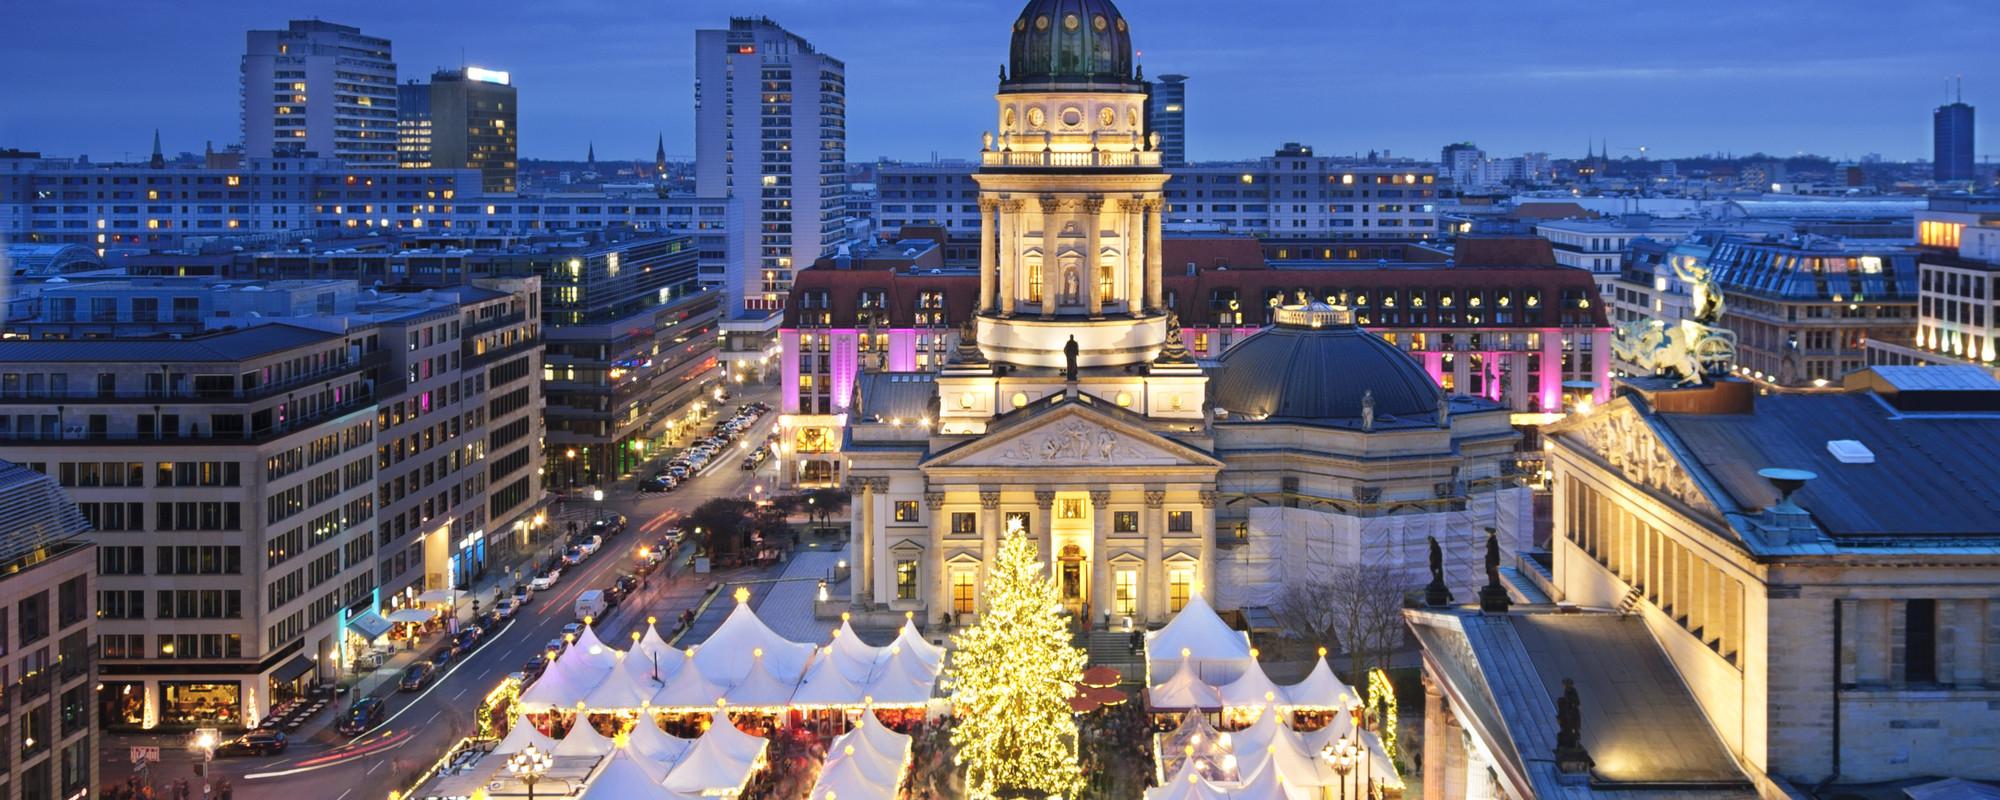 Joyful Greetings From Berlin Evento